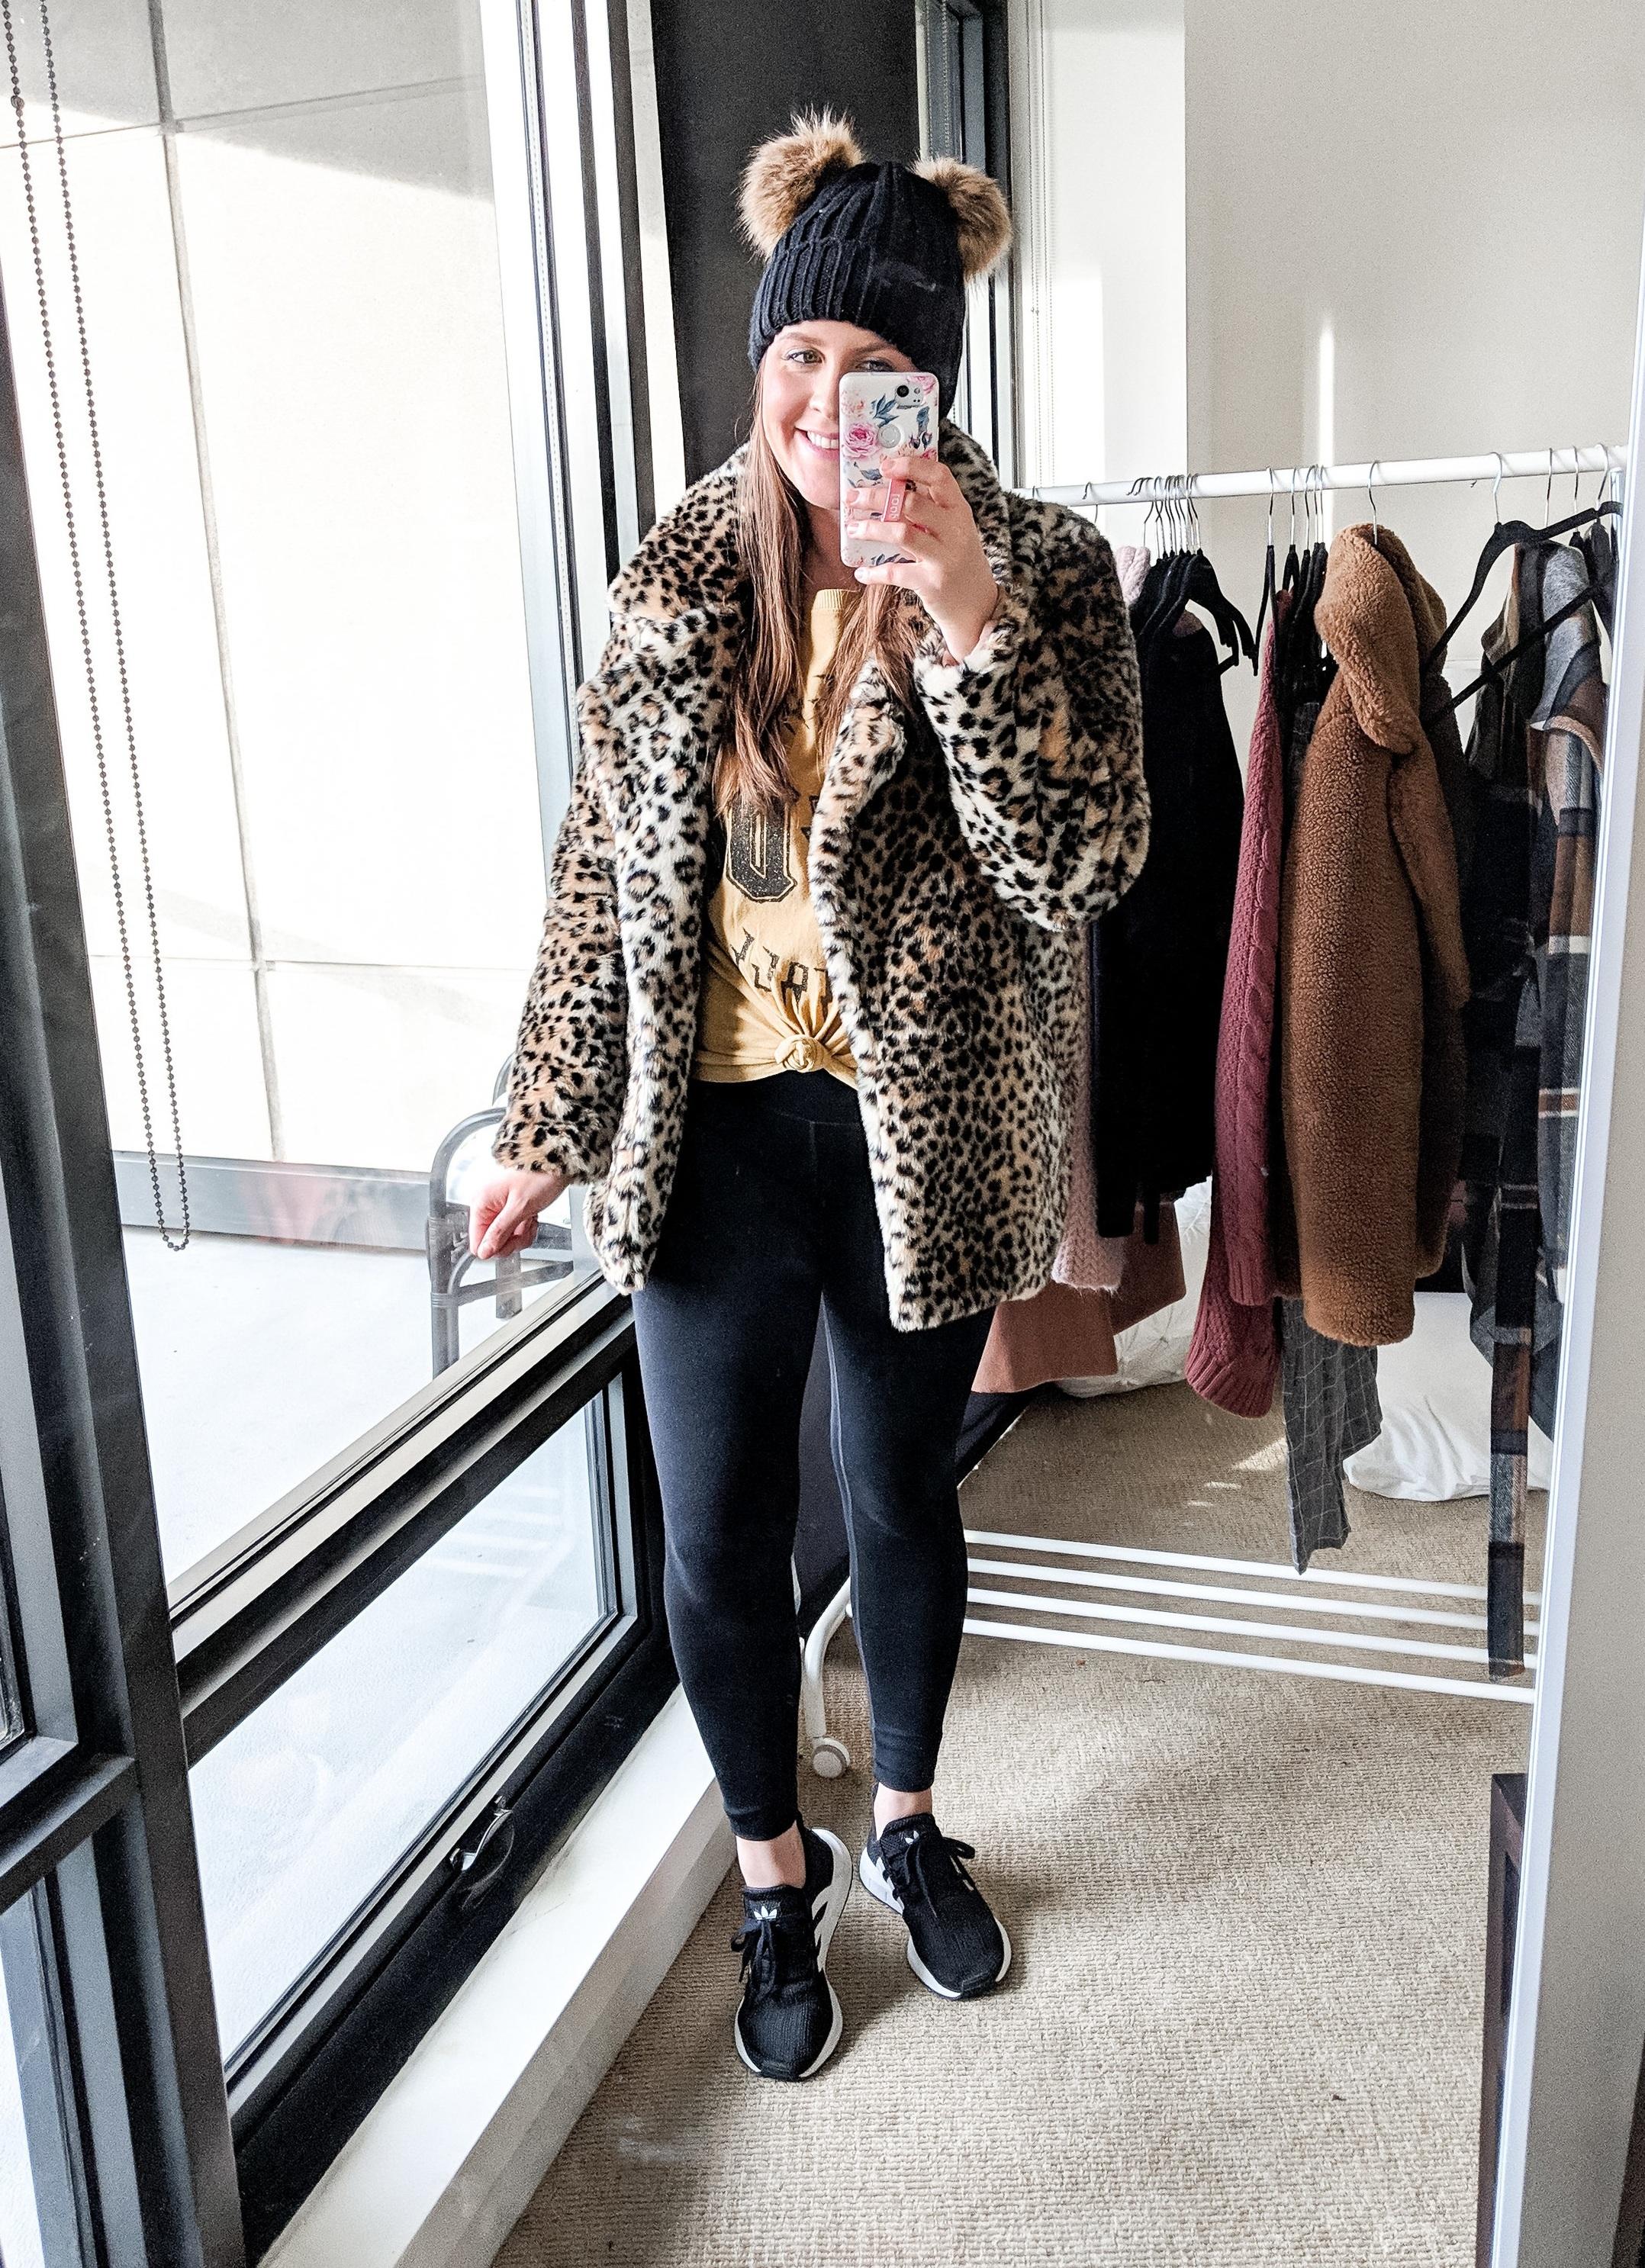 leopard%2Bfur%2Bcoat%2Bgraphic%2Btee%2Bathleisure%2Boutfit%2Bstylebyjulianne